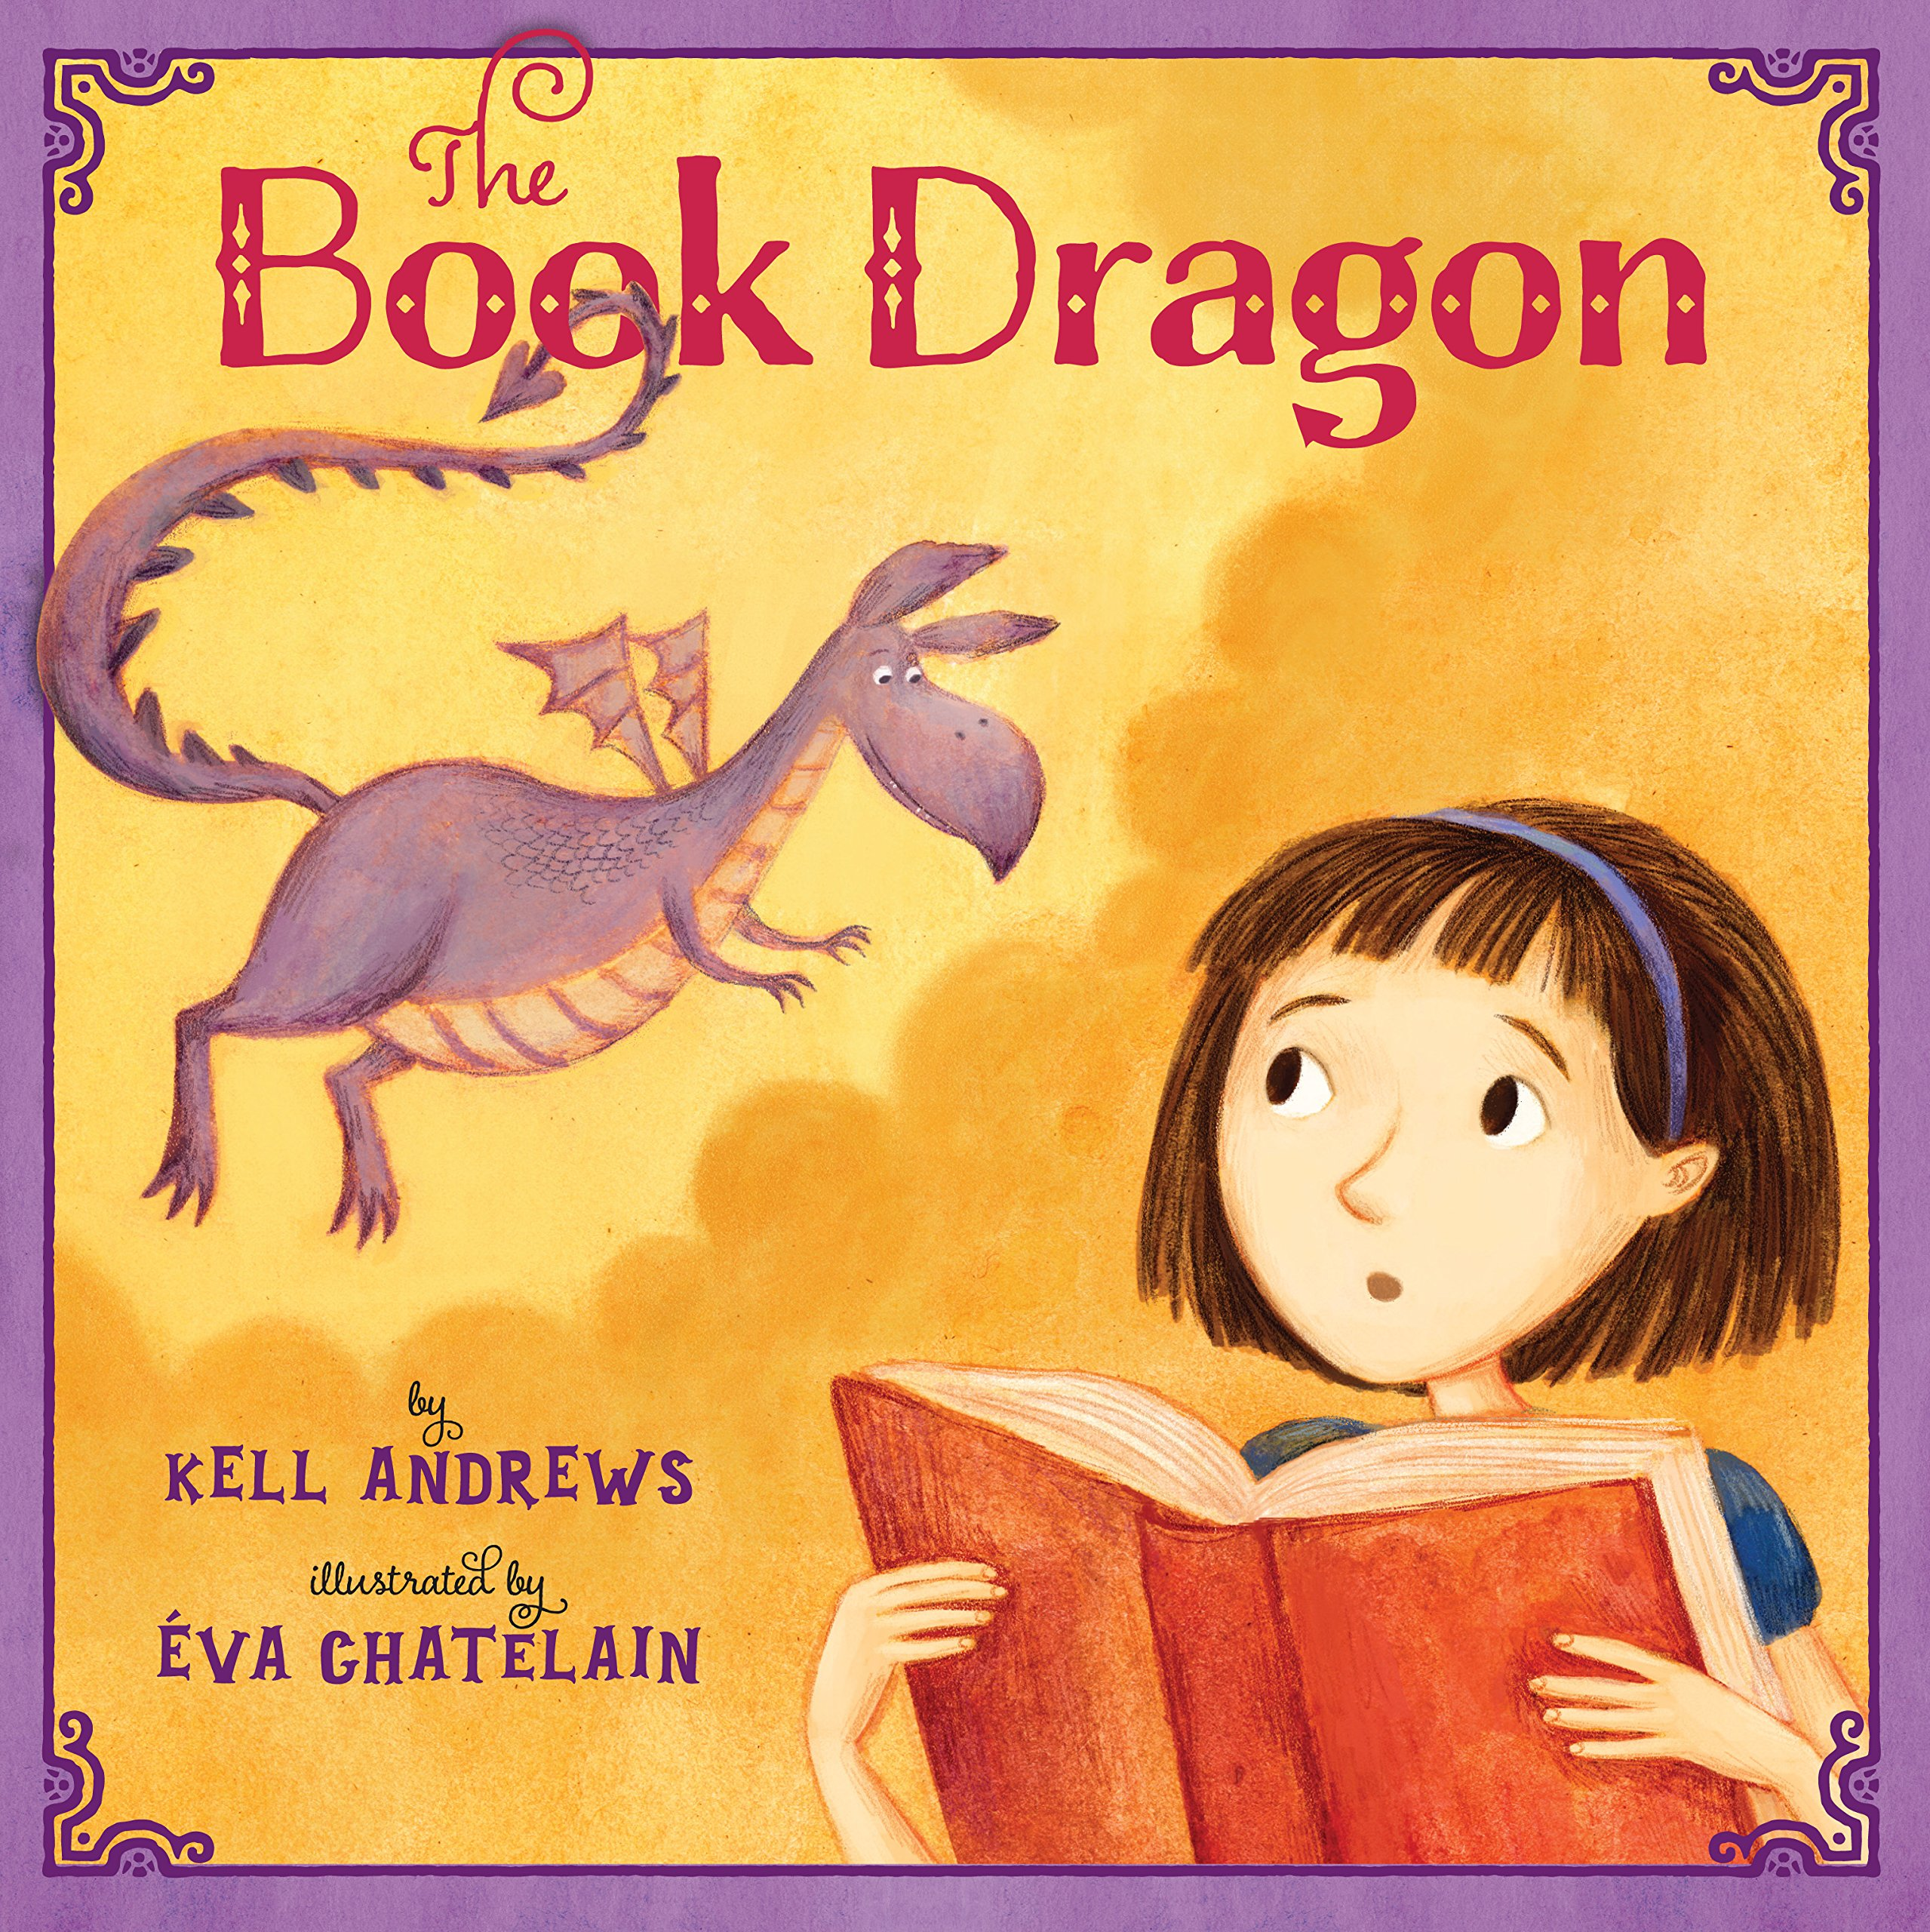 celebrate-picture-books-picture-book-review-the-book-dragon-cover